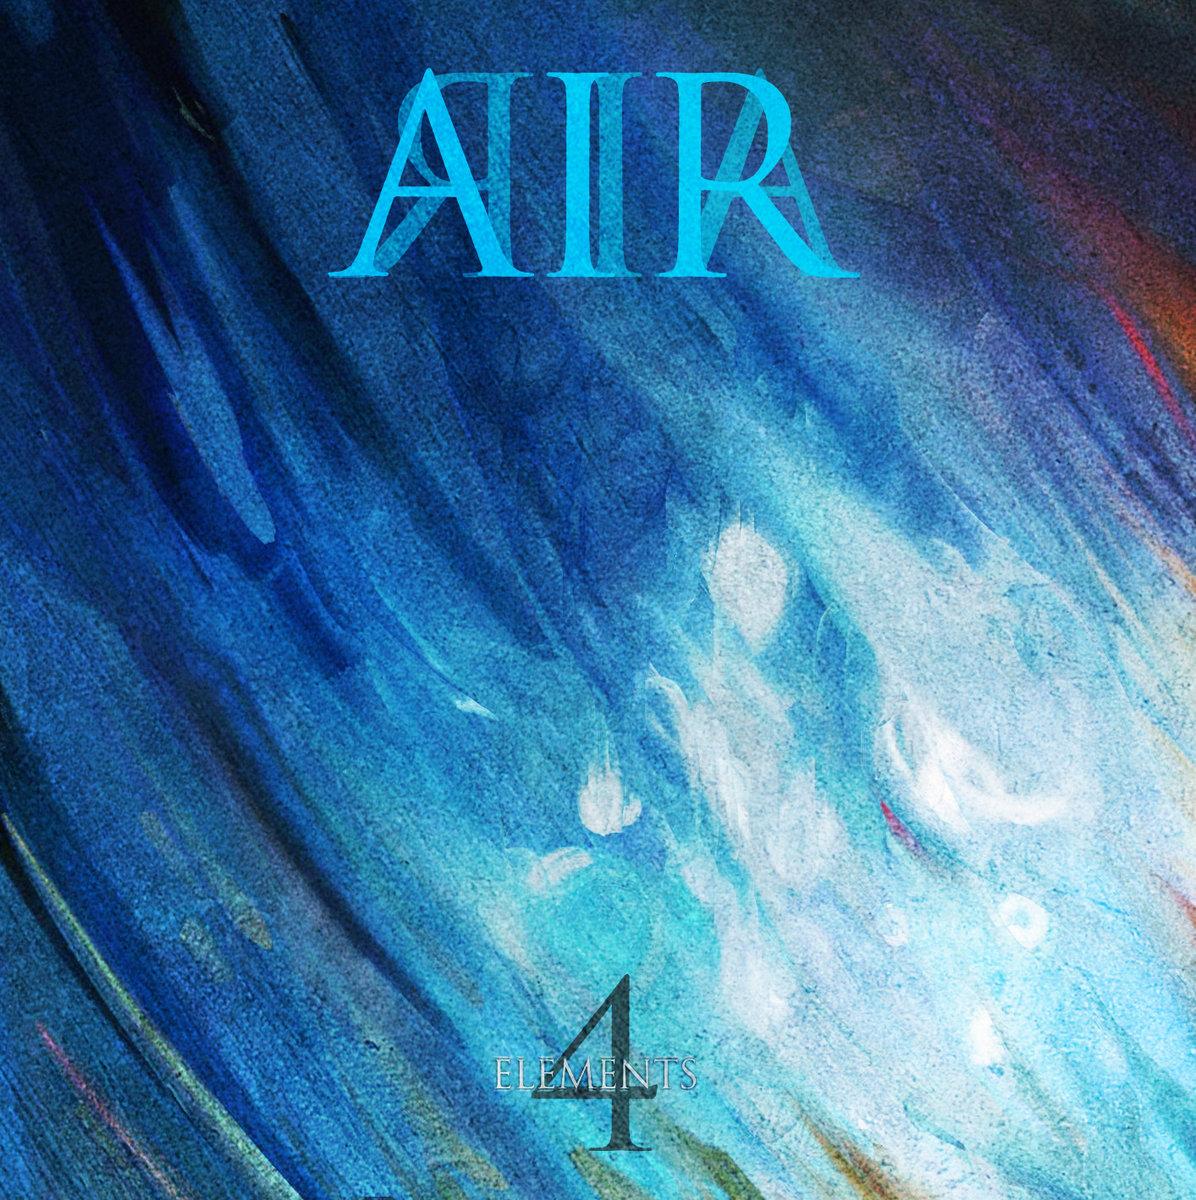 Air elements